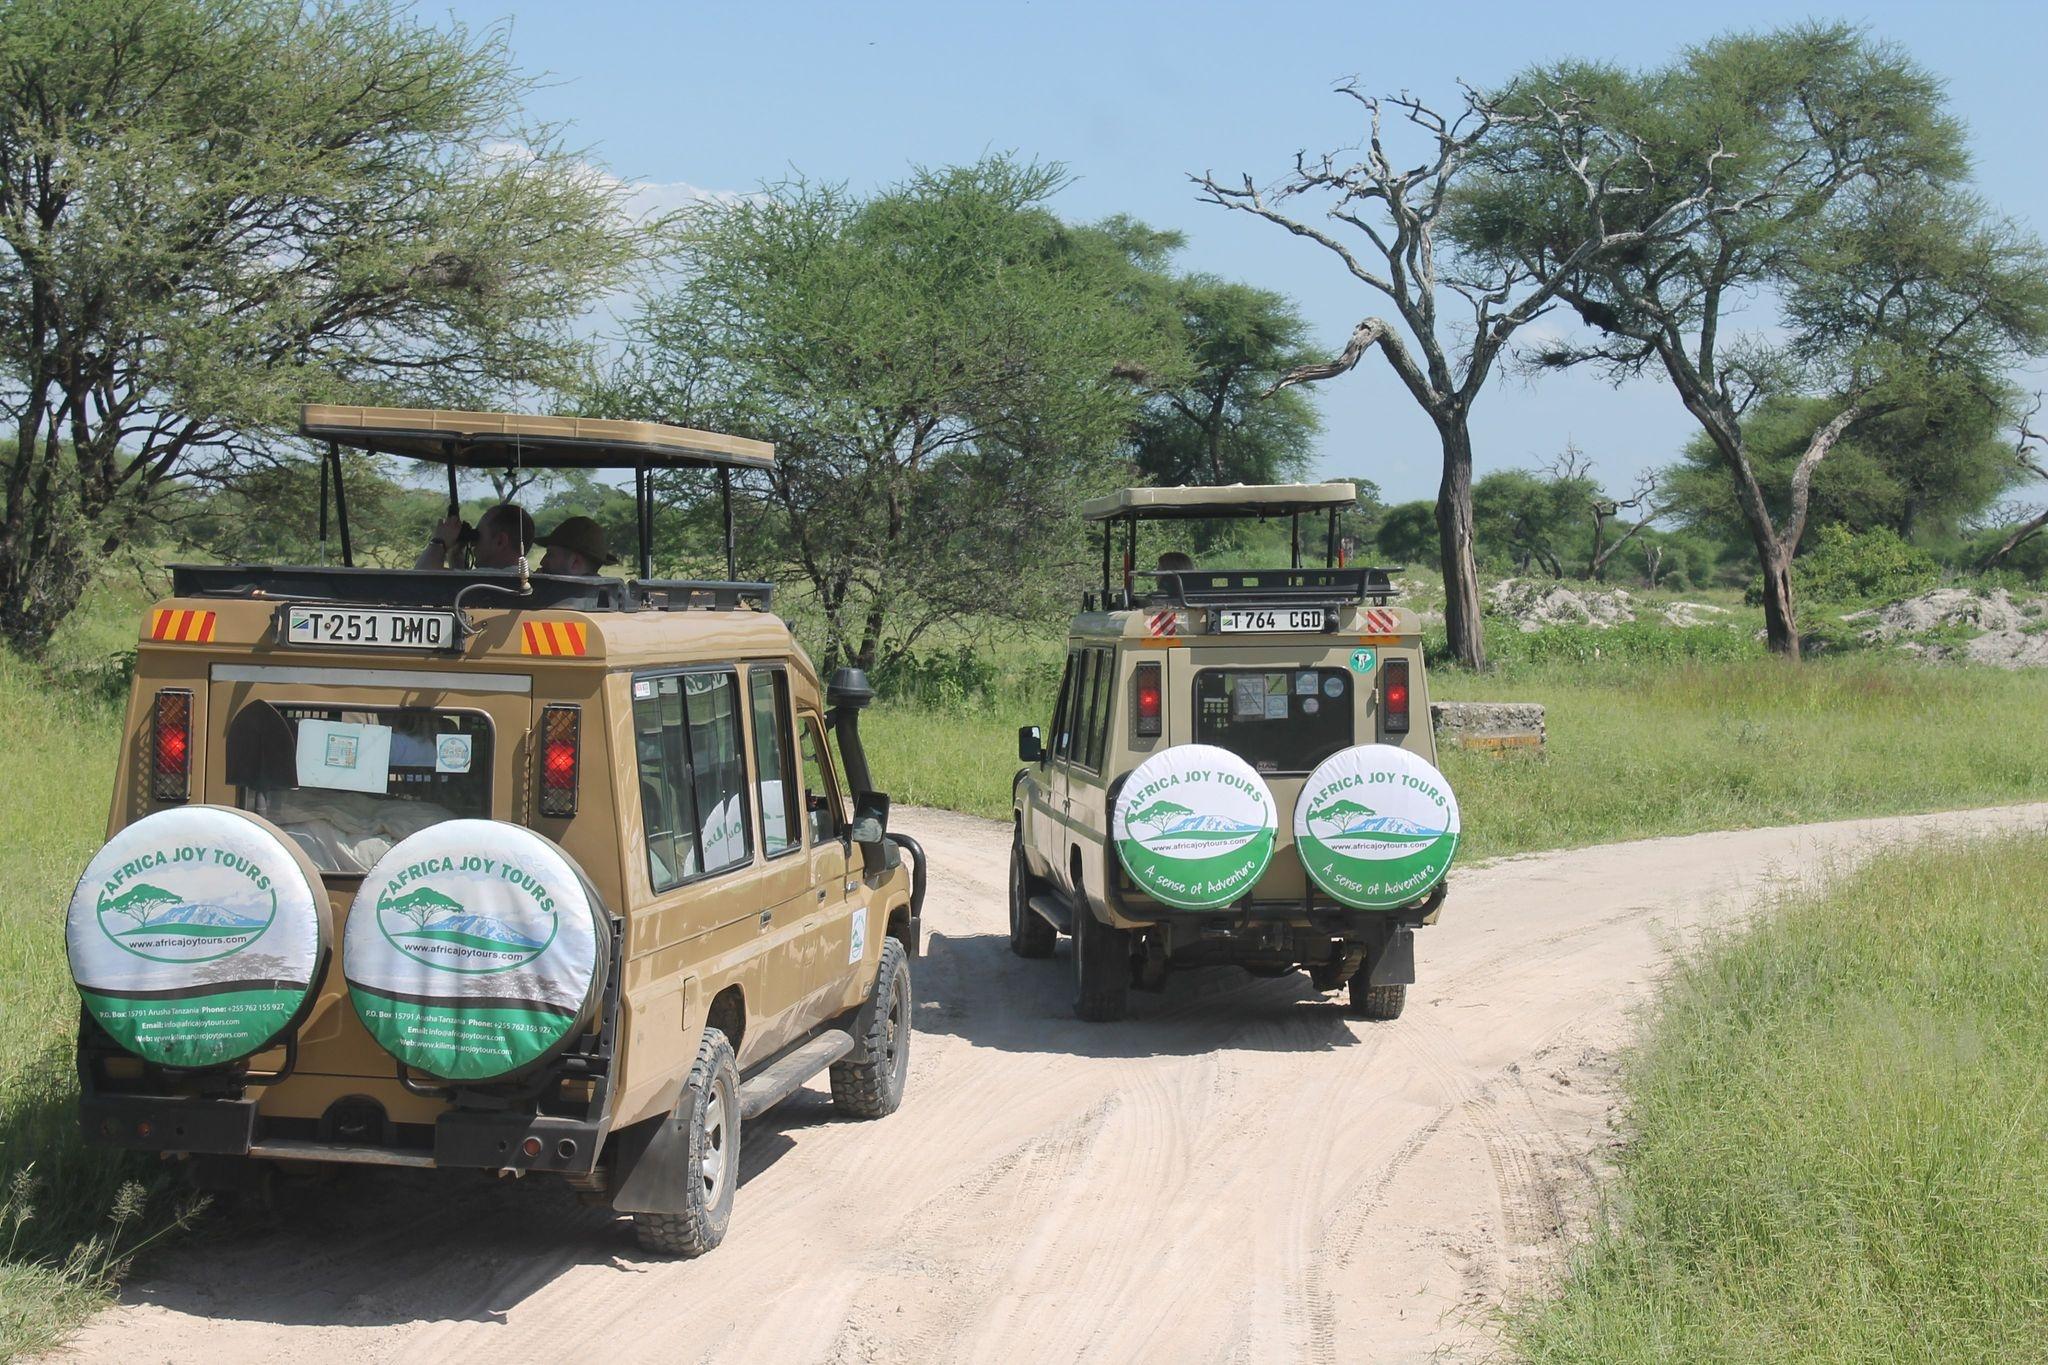 4 Day Tanzania Lodge Safari to Lake Manyara, Serengeti & Ngorongoro Crater